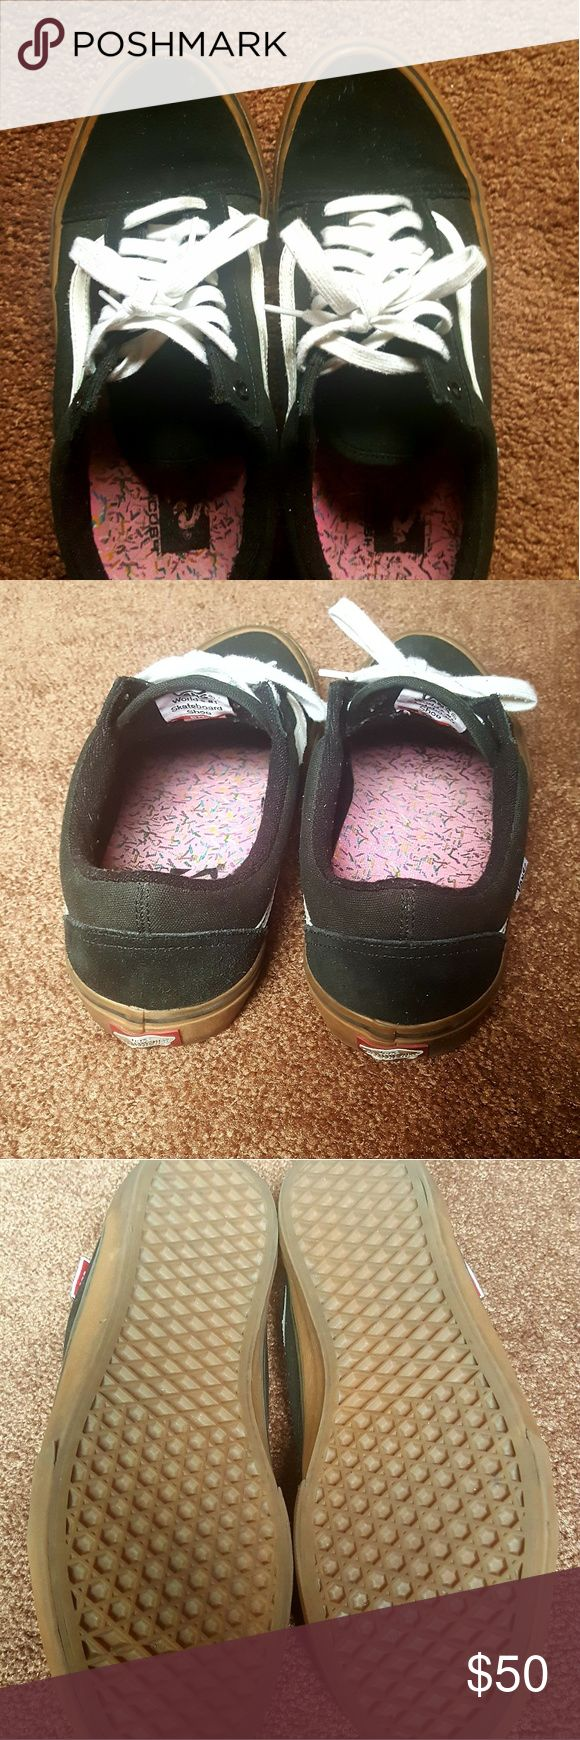 Selling this Vans old skool pro skate sneakers on Poshmark! My username is: prettiinink. #shopmycloset #poshmark #fashion #shopping #style #forsale #Vans #Other